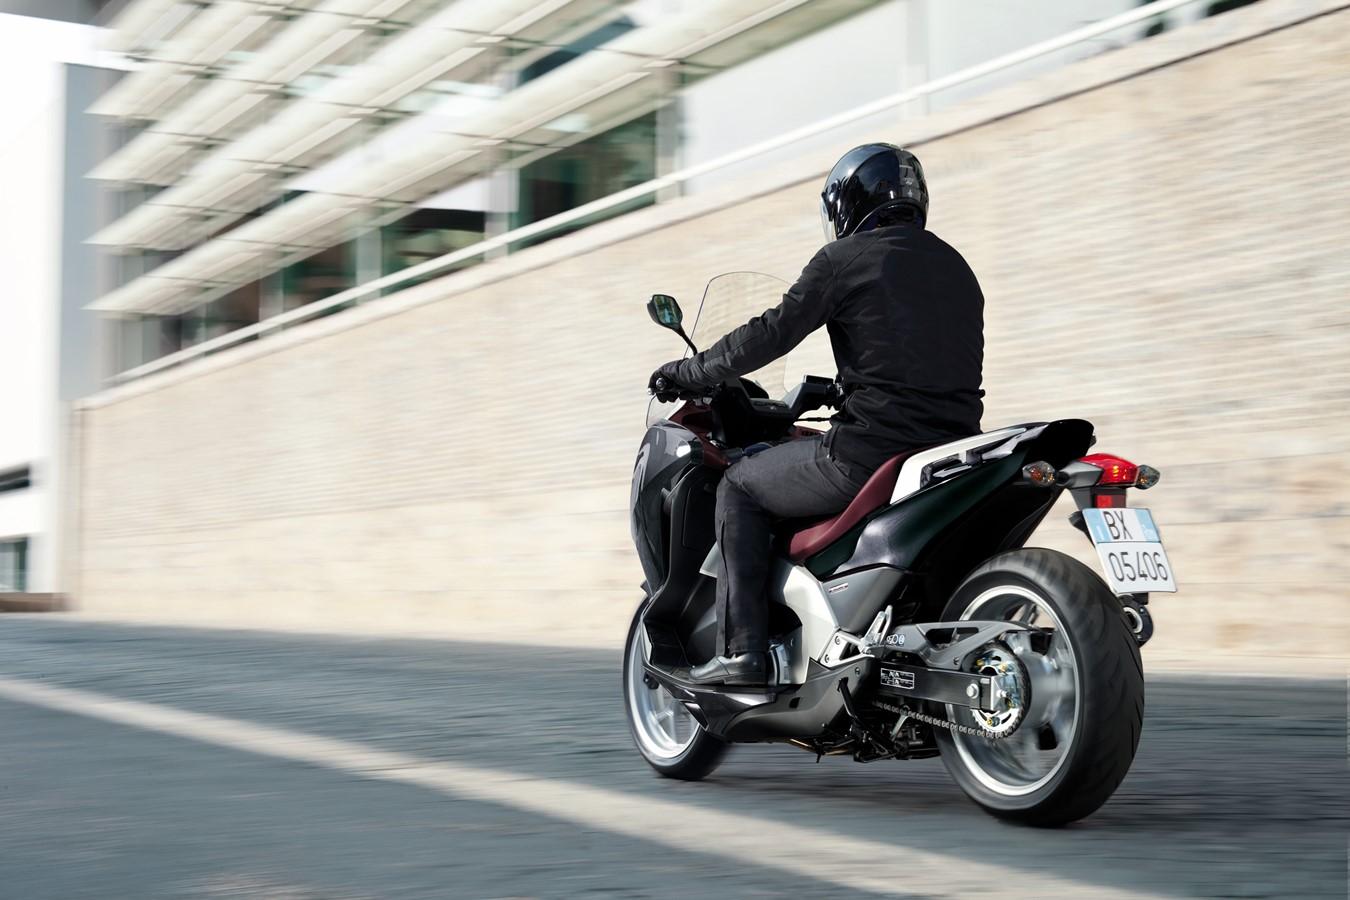 Honda At Eicma 2011 2006 Cbr600rr Behind Left Middle Fairing Fuse Box Diagram